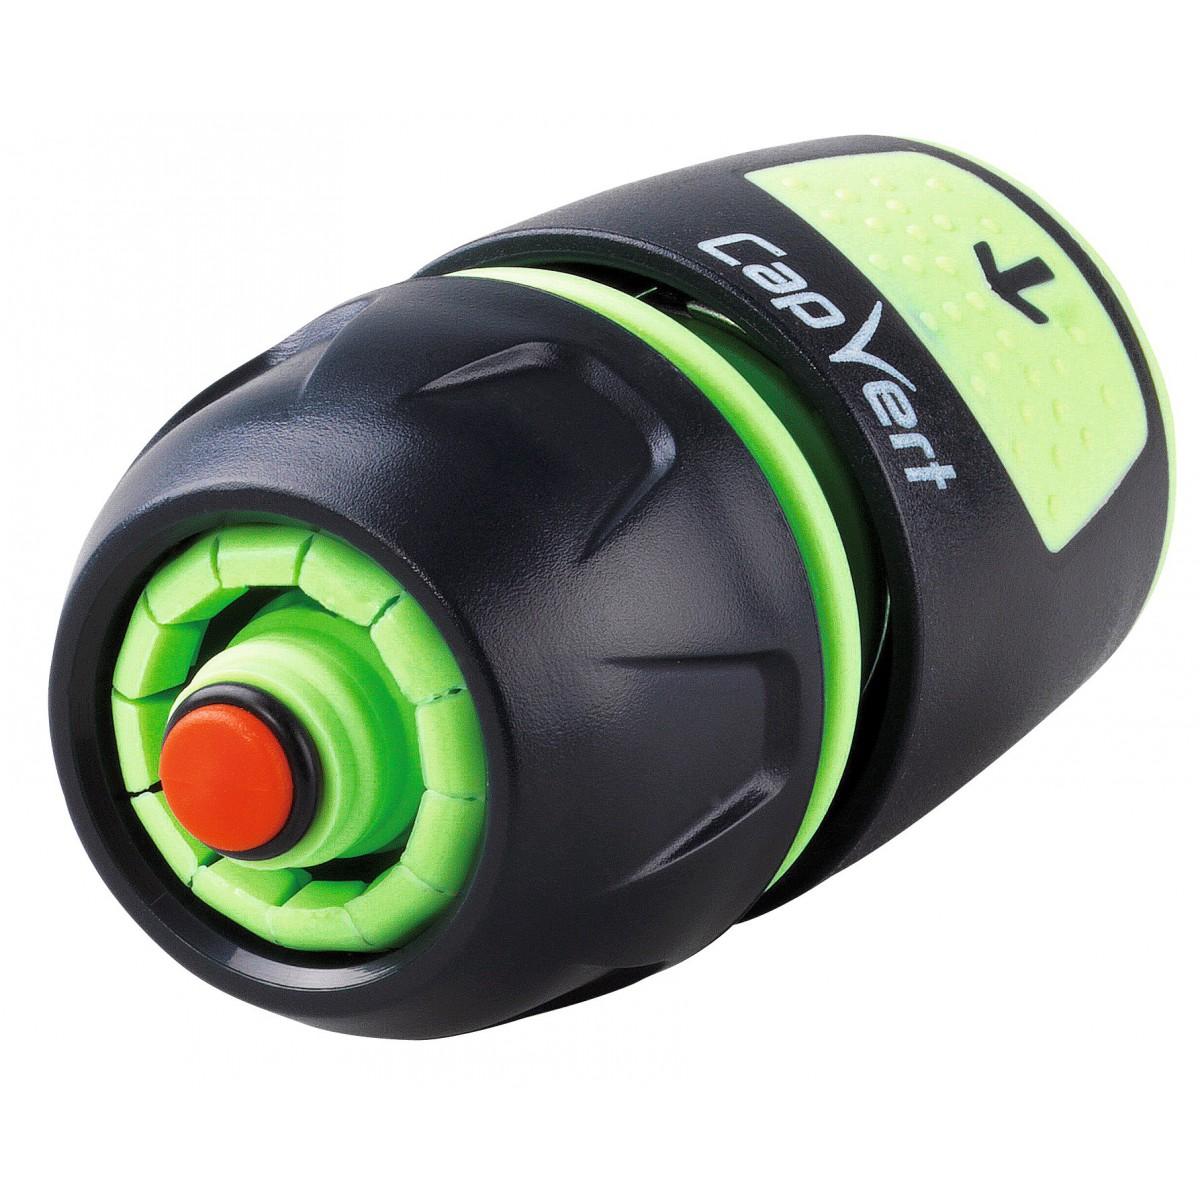 Raccord rapide stop universel Cap Vert - Diamètre 13 - 15 - 19 mm